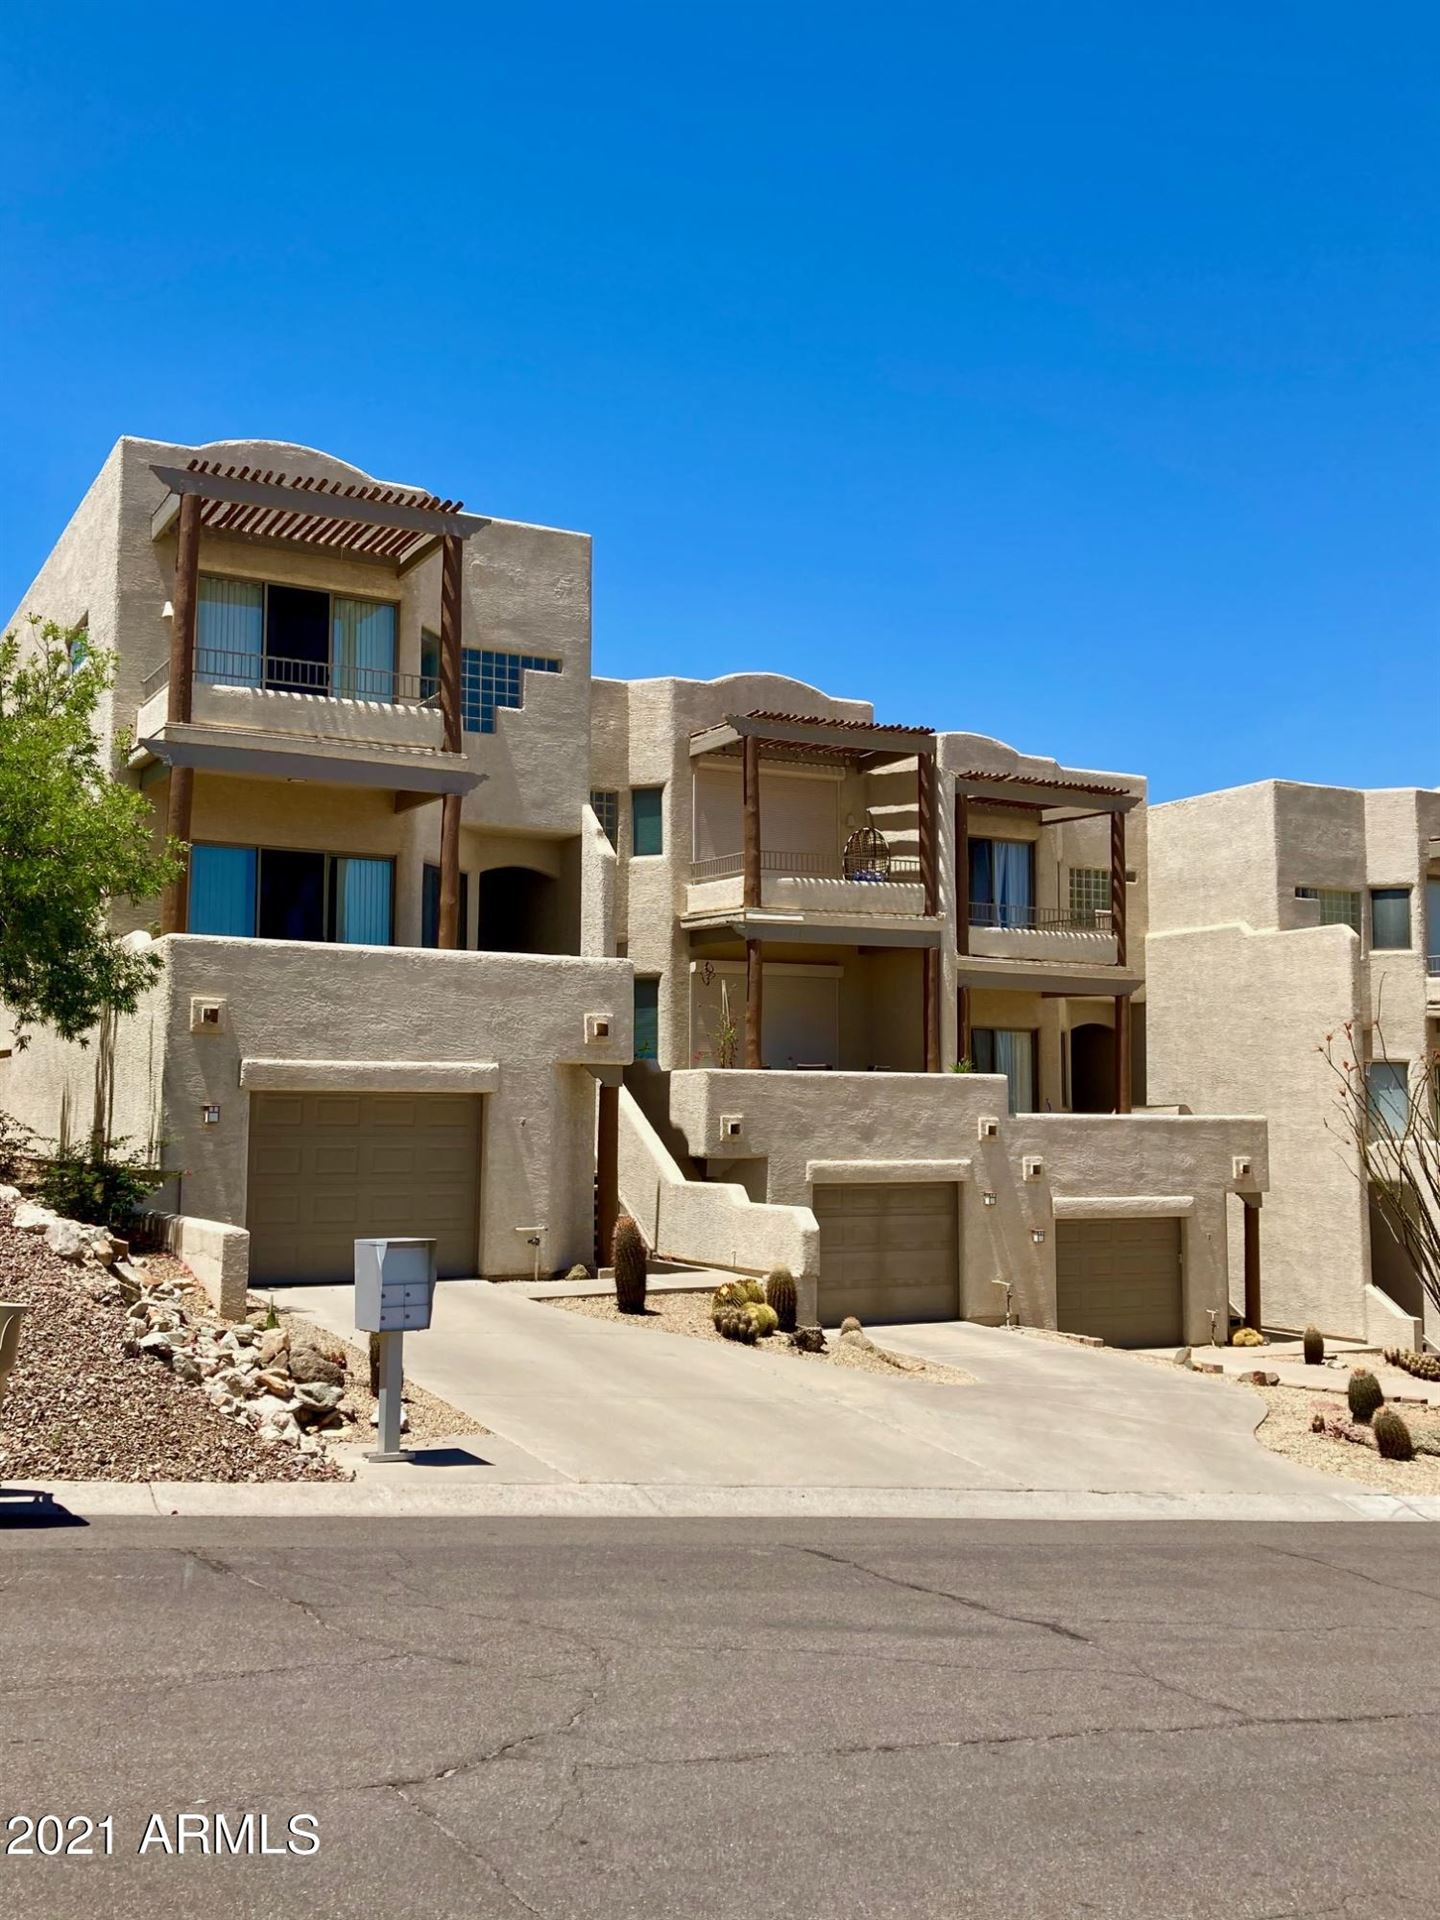 Photo of 12836 N MOUNTAINSIDE Drive #3, Fountain Hills, AZ 85268 (MLS # 6231396)